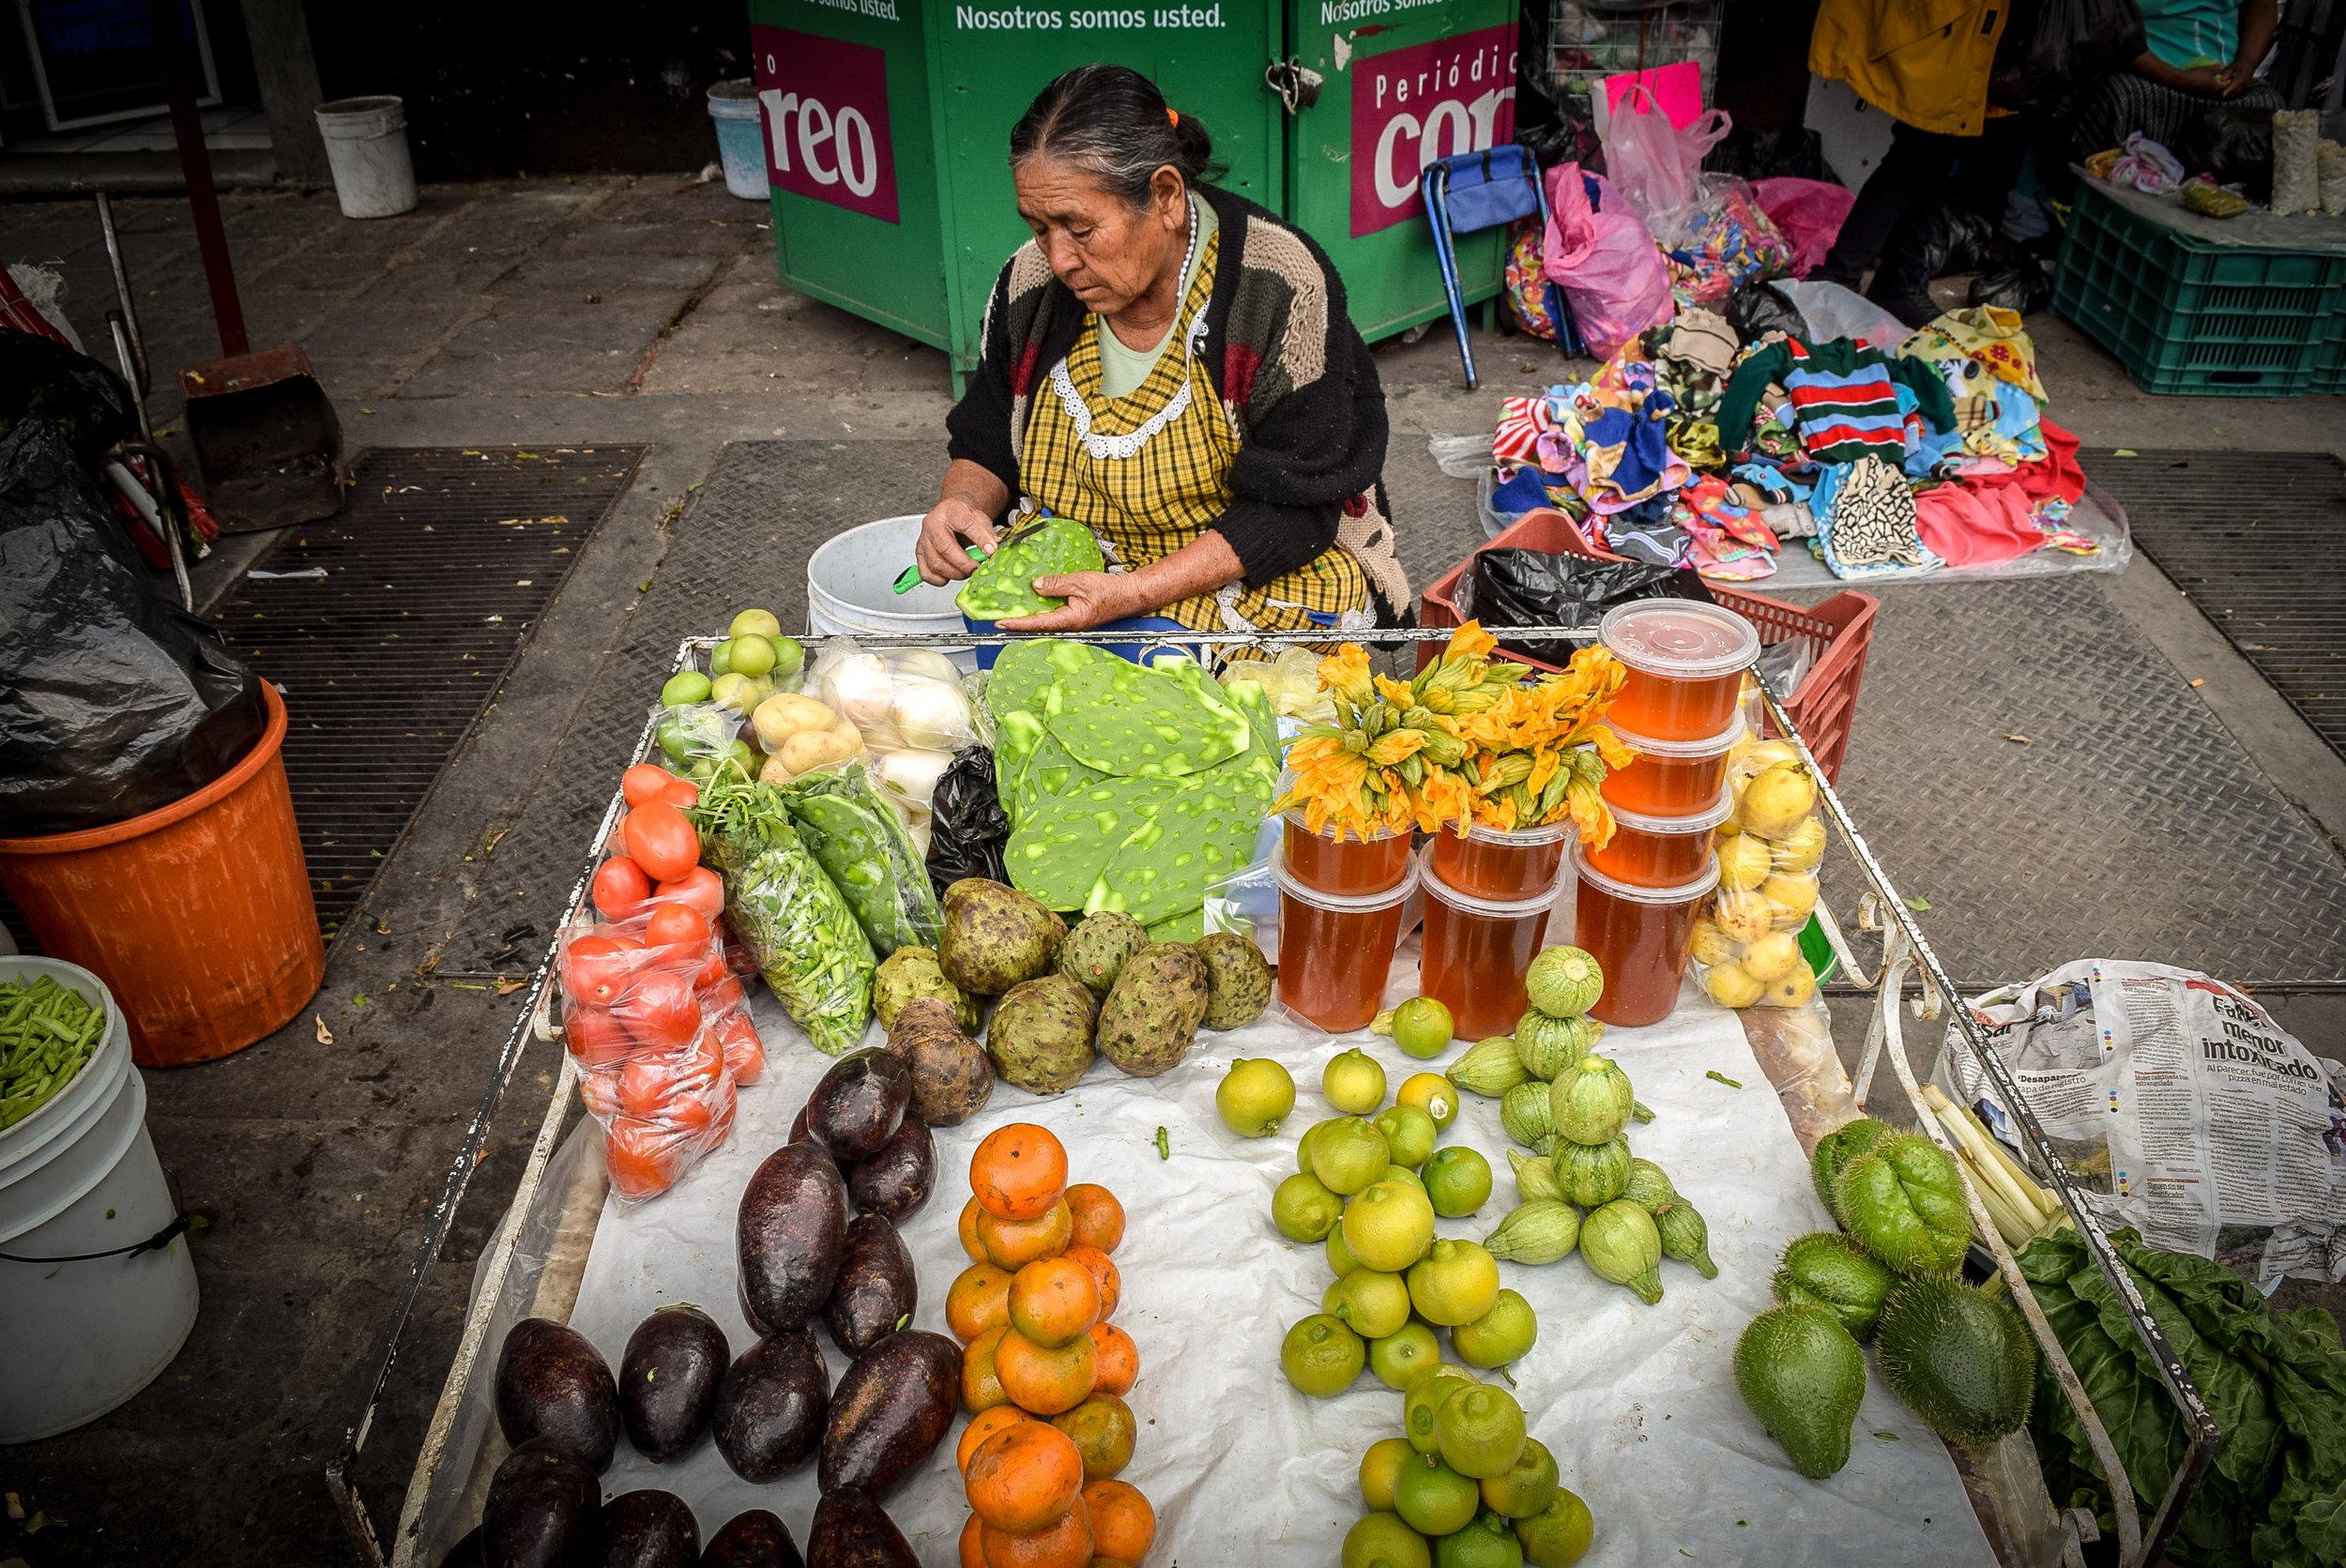 Street vendor in Guanajuato